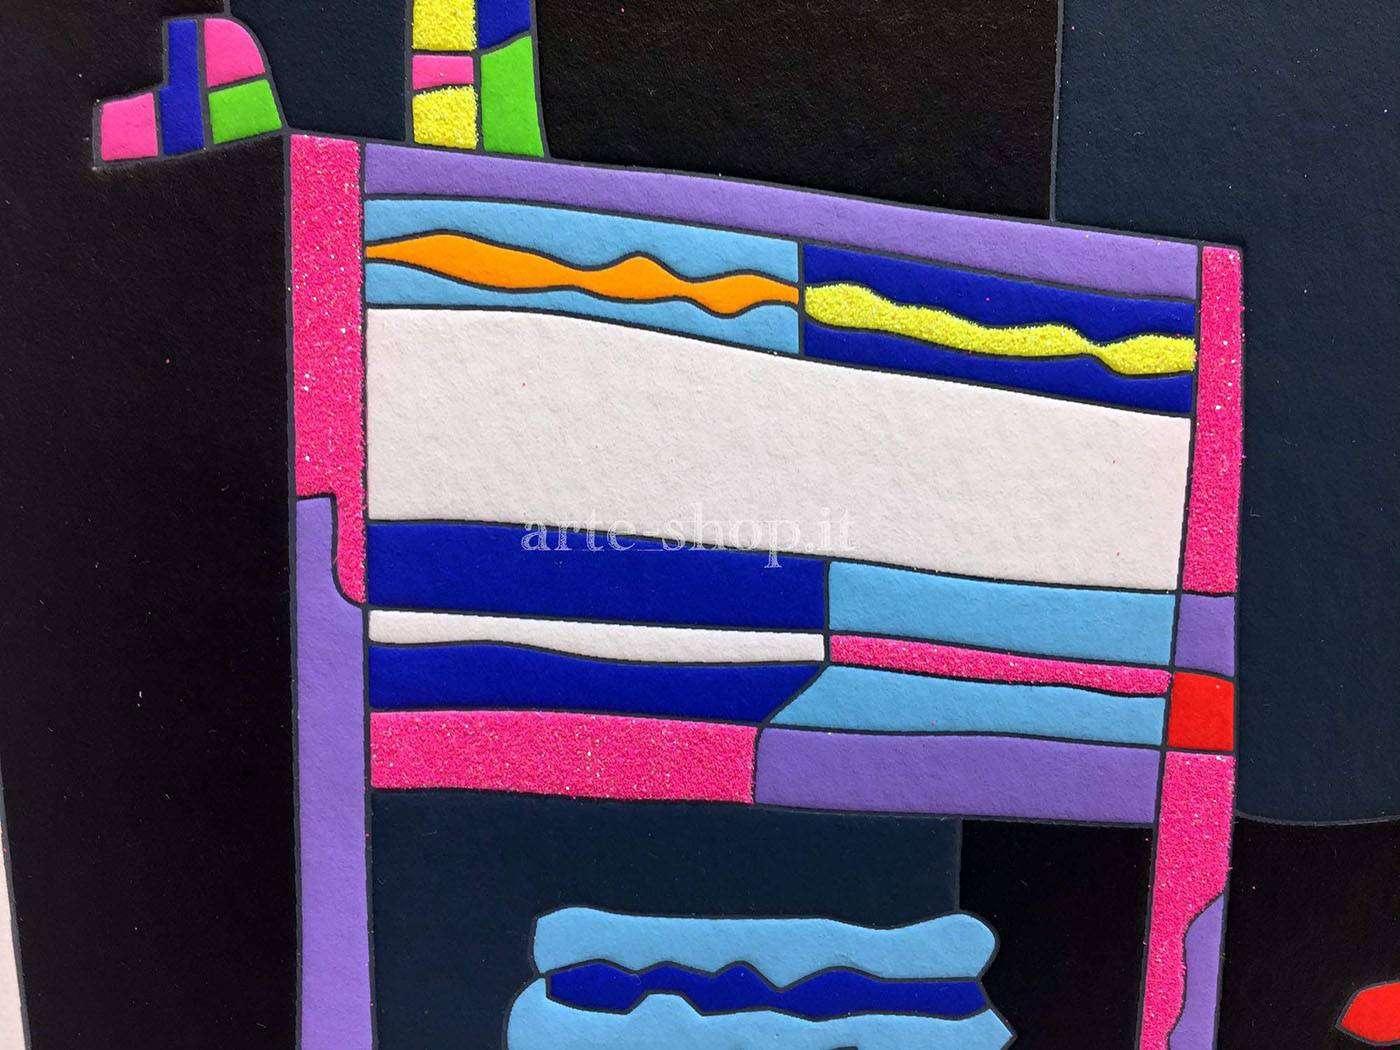 arte pentagono shop dettaglio numero 234